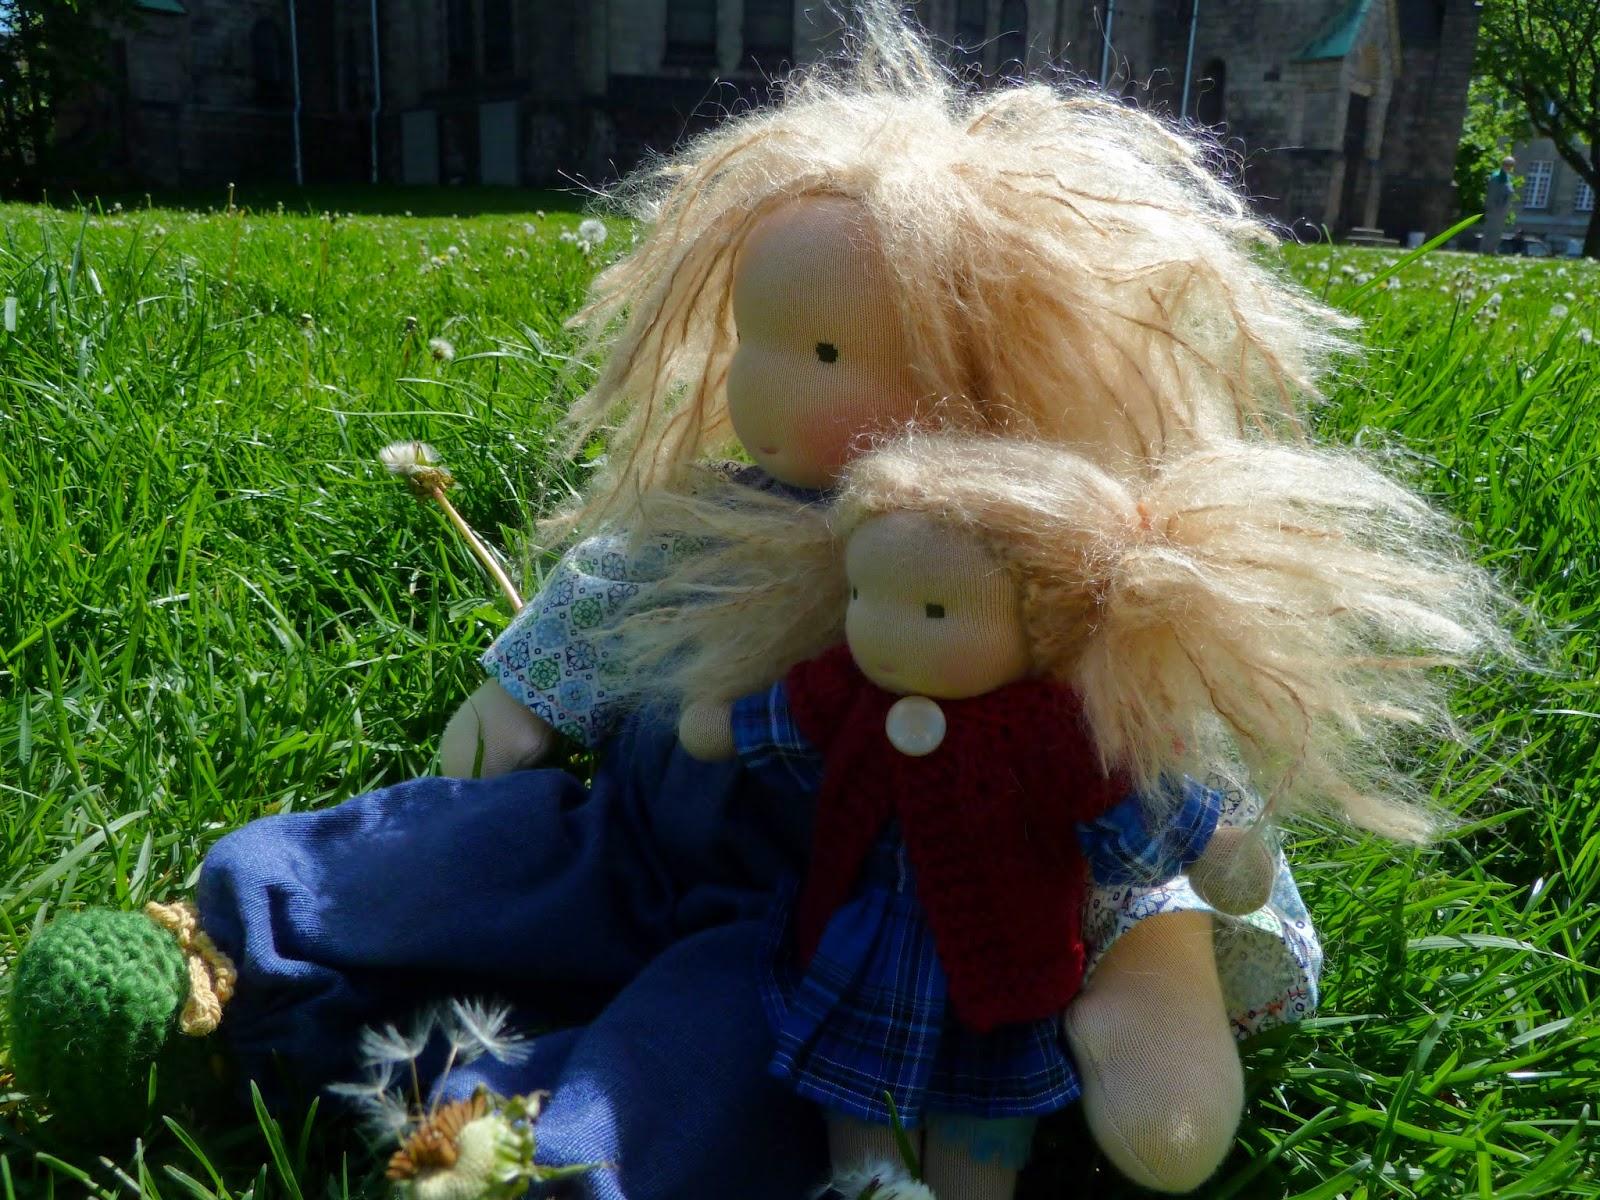 waldorf puppe, waldorf doll